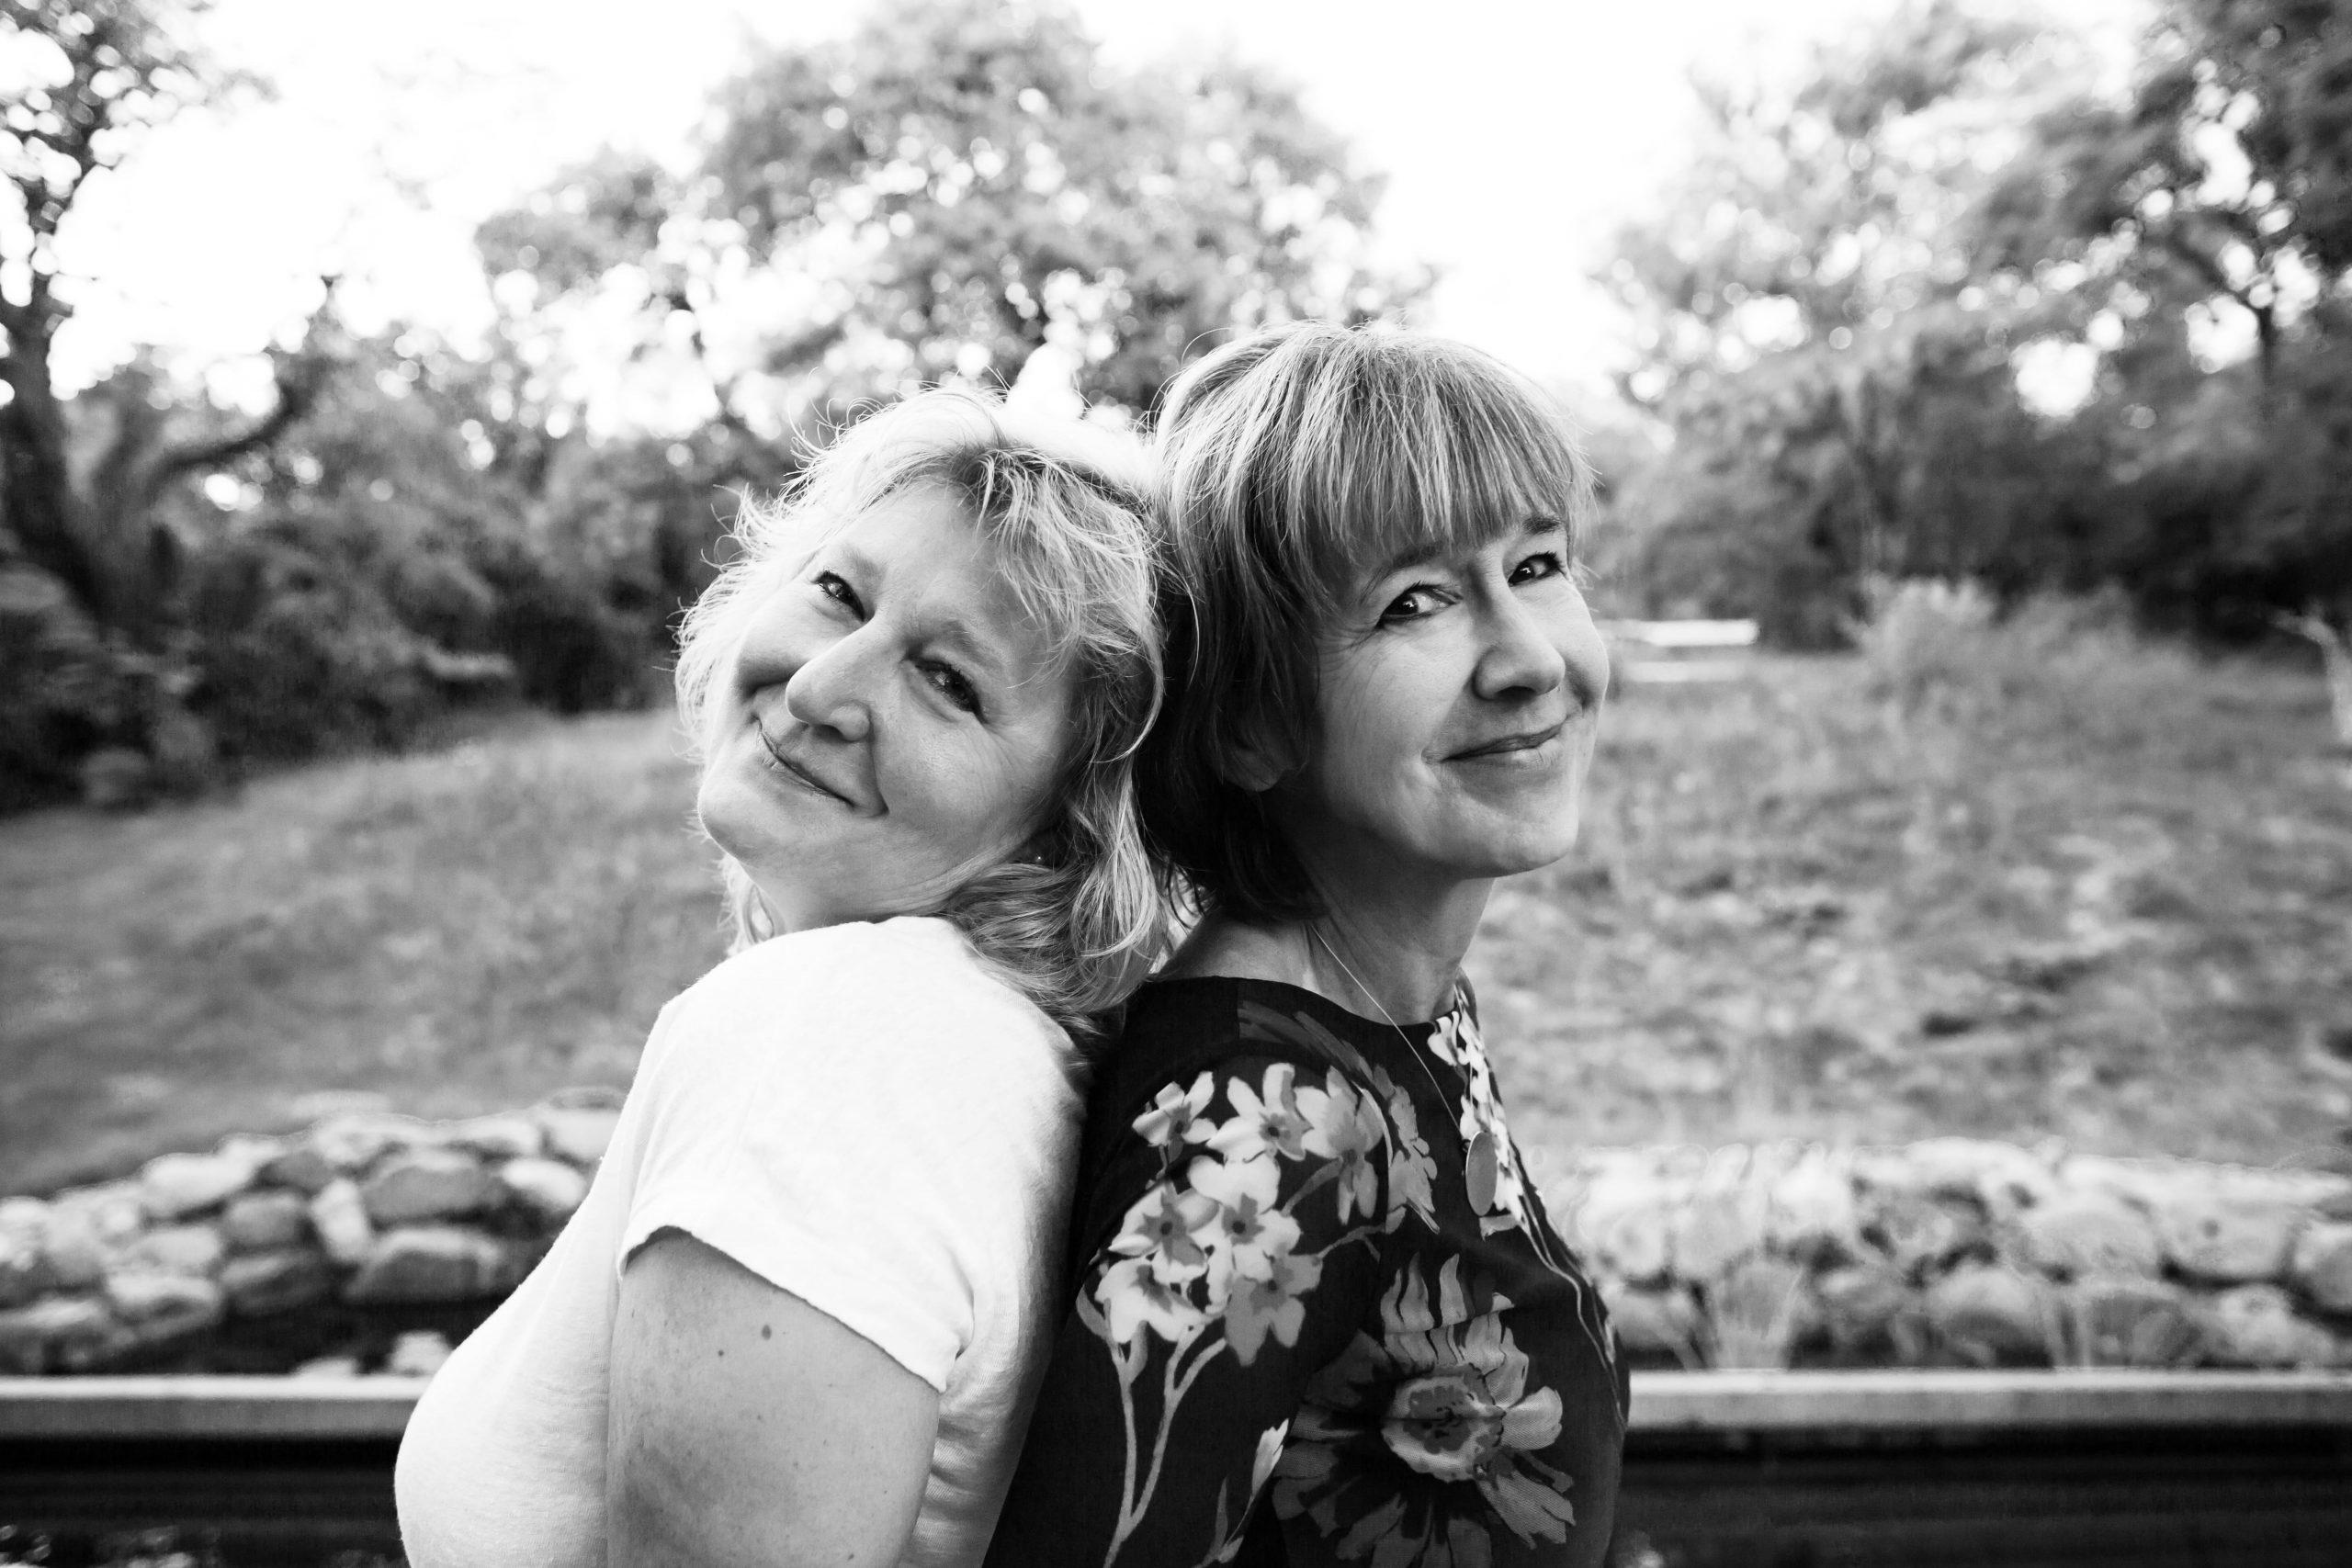 Portrait friendship shooting Photography black white Christina Hein